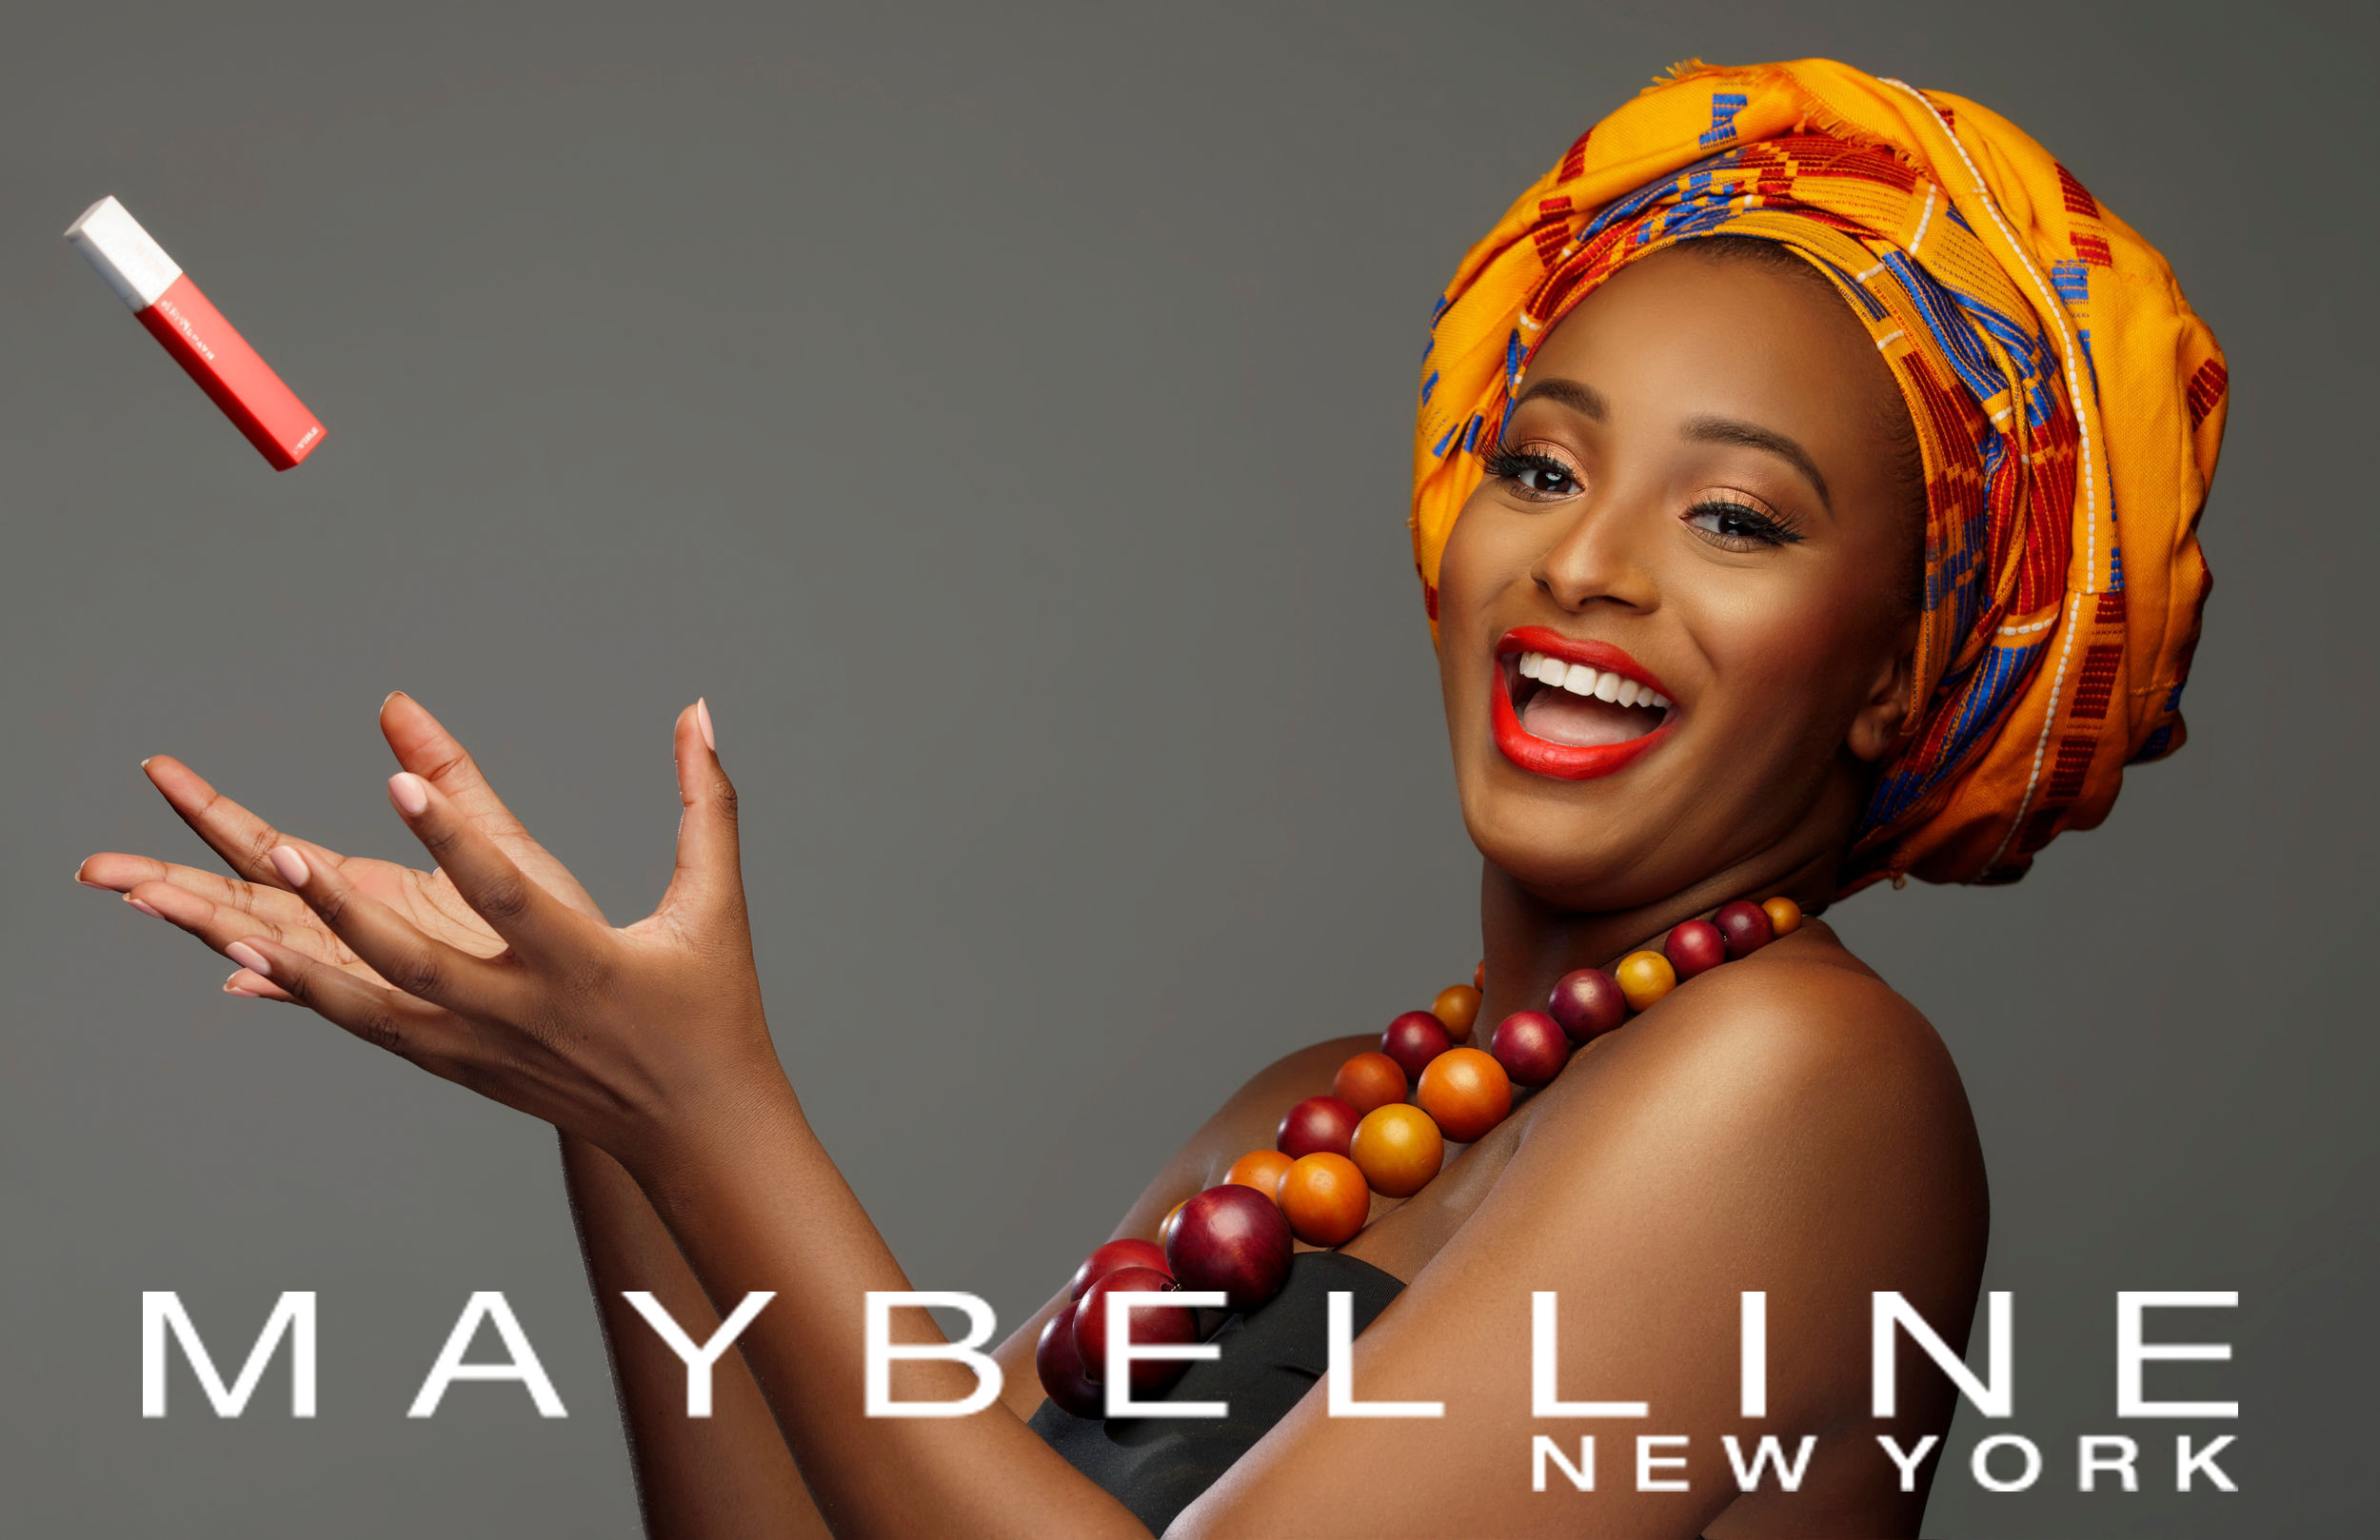 Maybelline New York Nigeria announces DJ Cuppy as